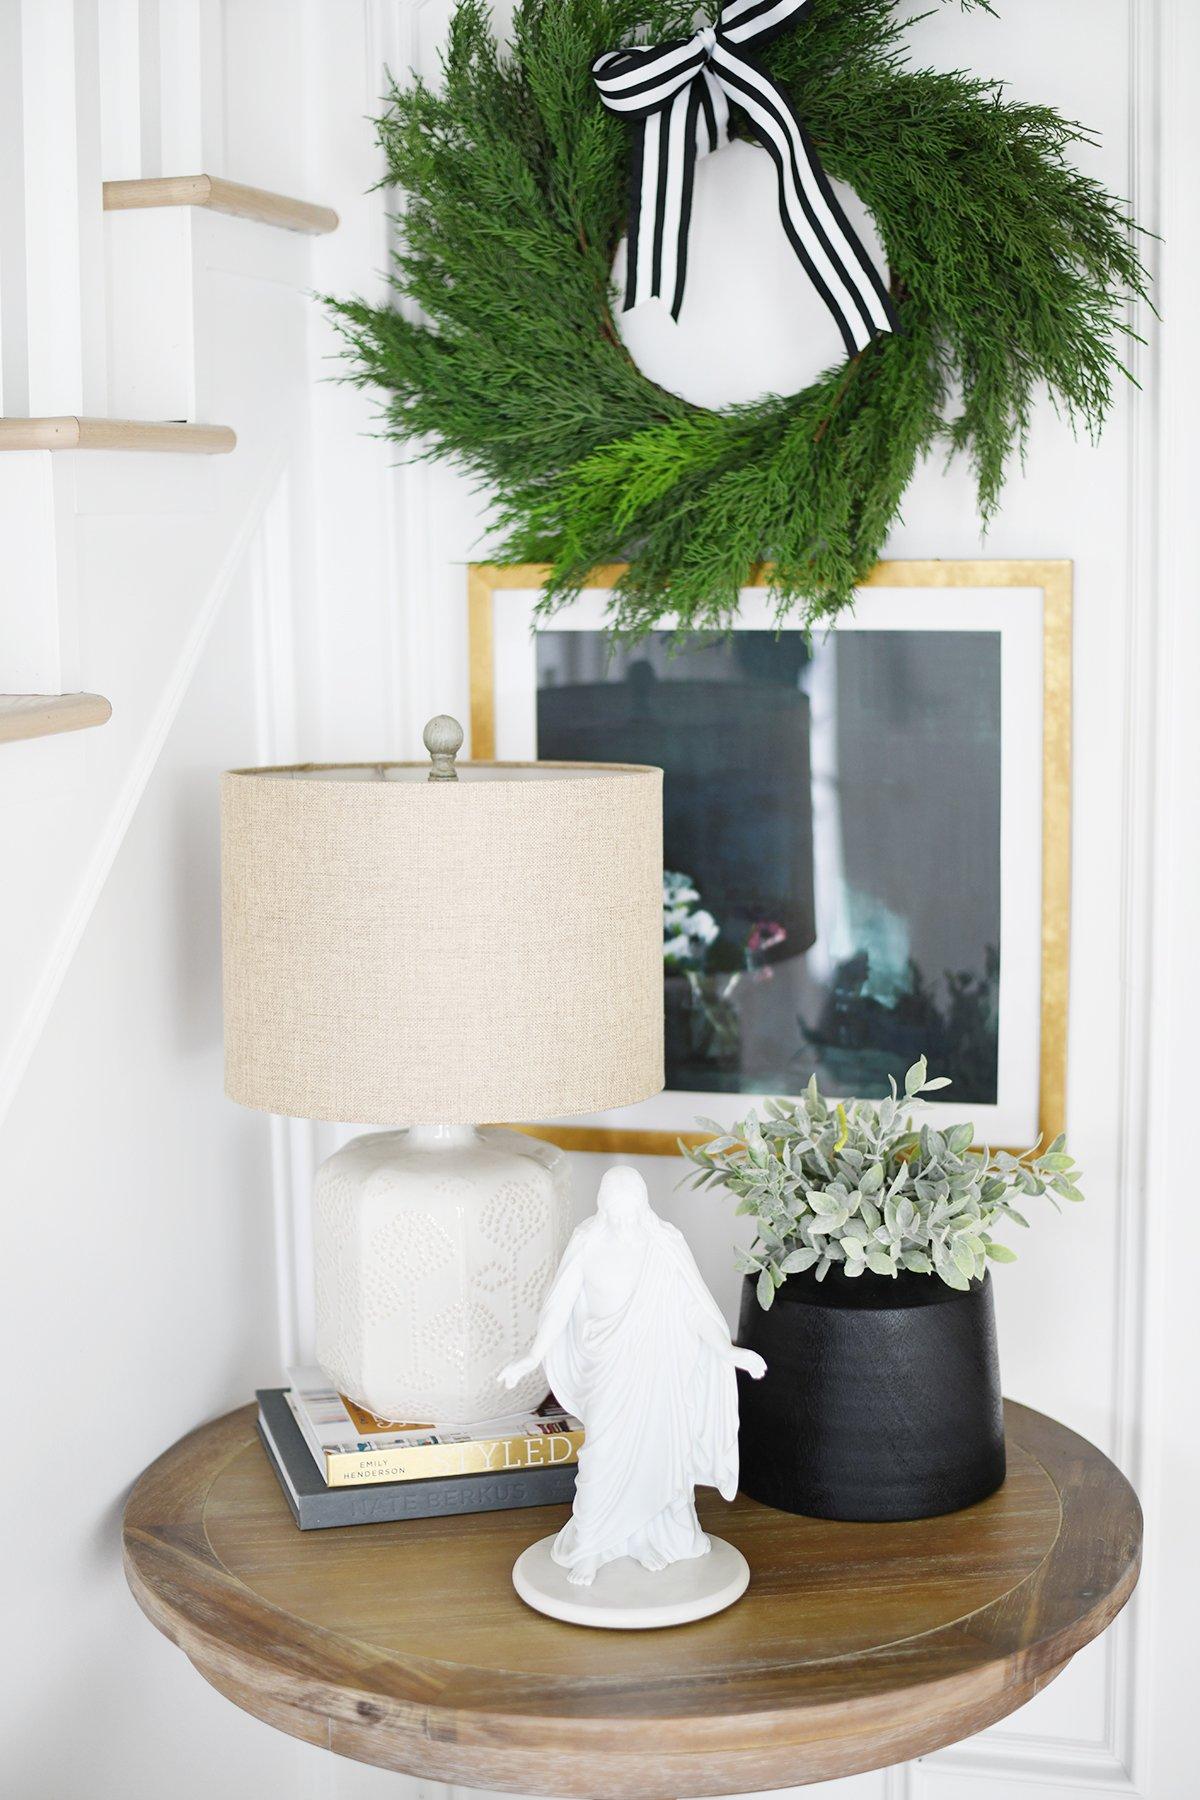 Christmas entry way decor 2